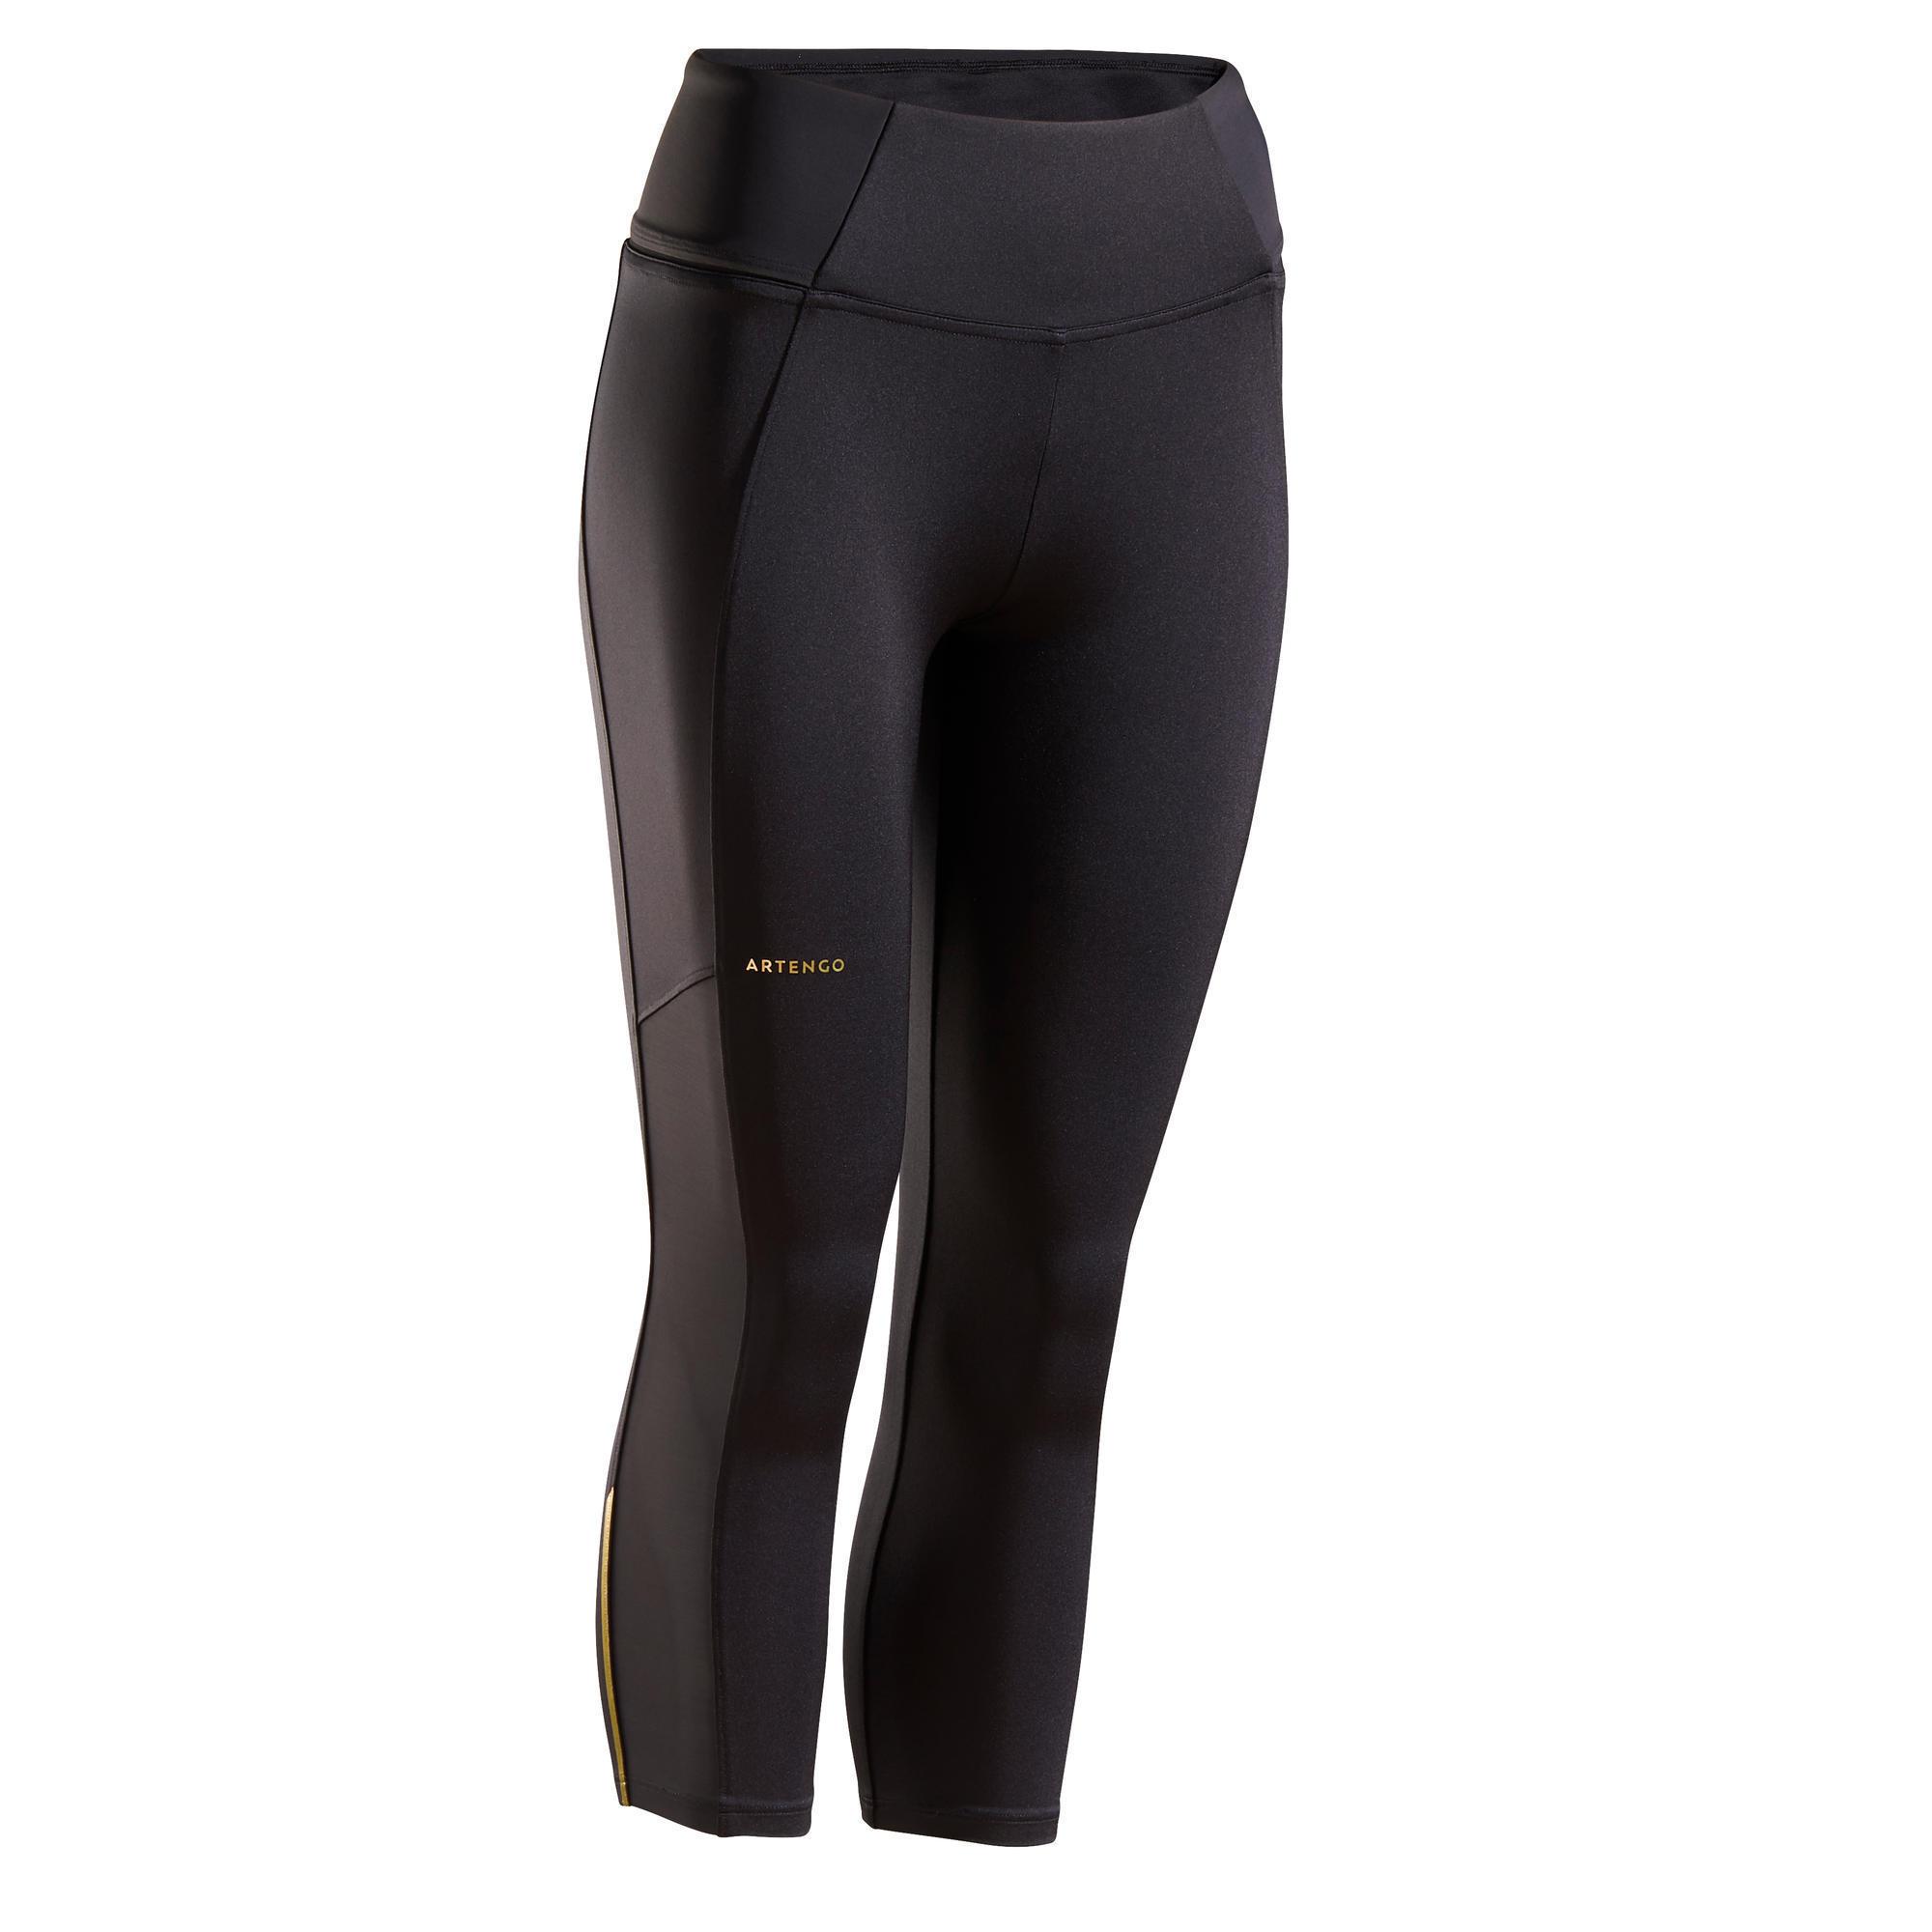 Tennishose 3/4-Hose Dry 900 Damen | Sportbekleidung > Sporthosen > Tennisshorts | Artengo